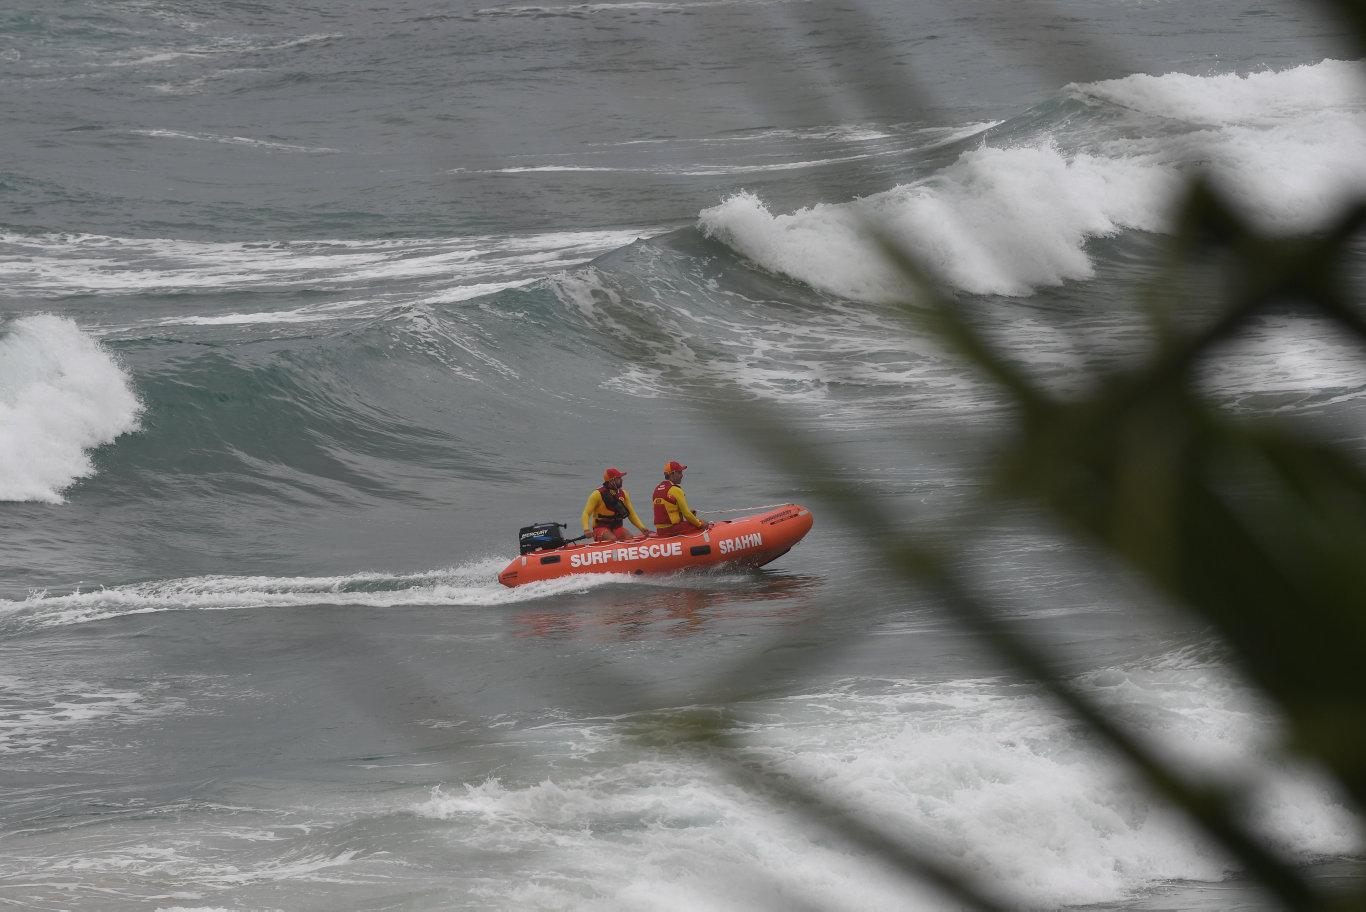 Ballina surf lifesavers conducting water searches for Raz Burtonwood at Lighthouse Beach in Ballina.